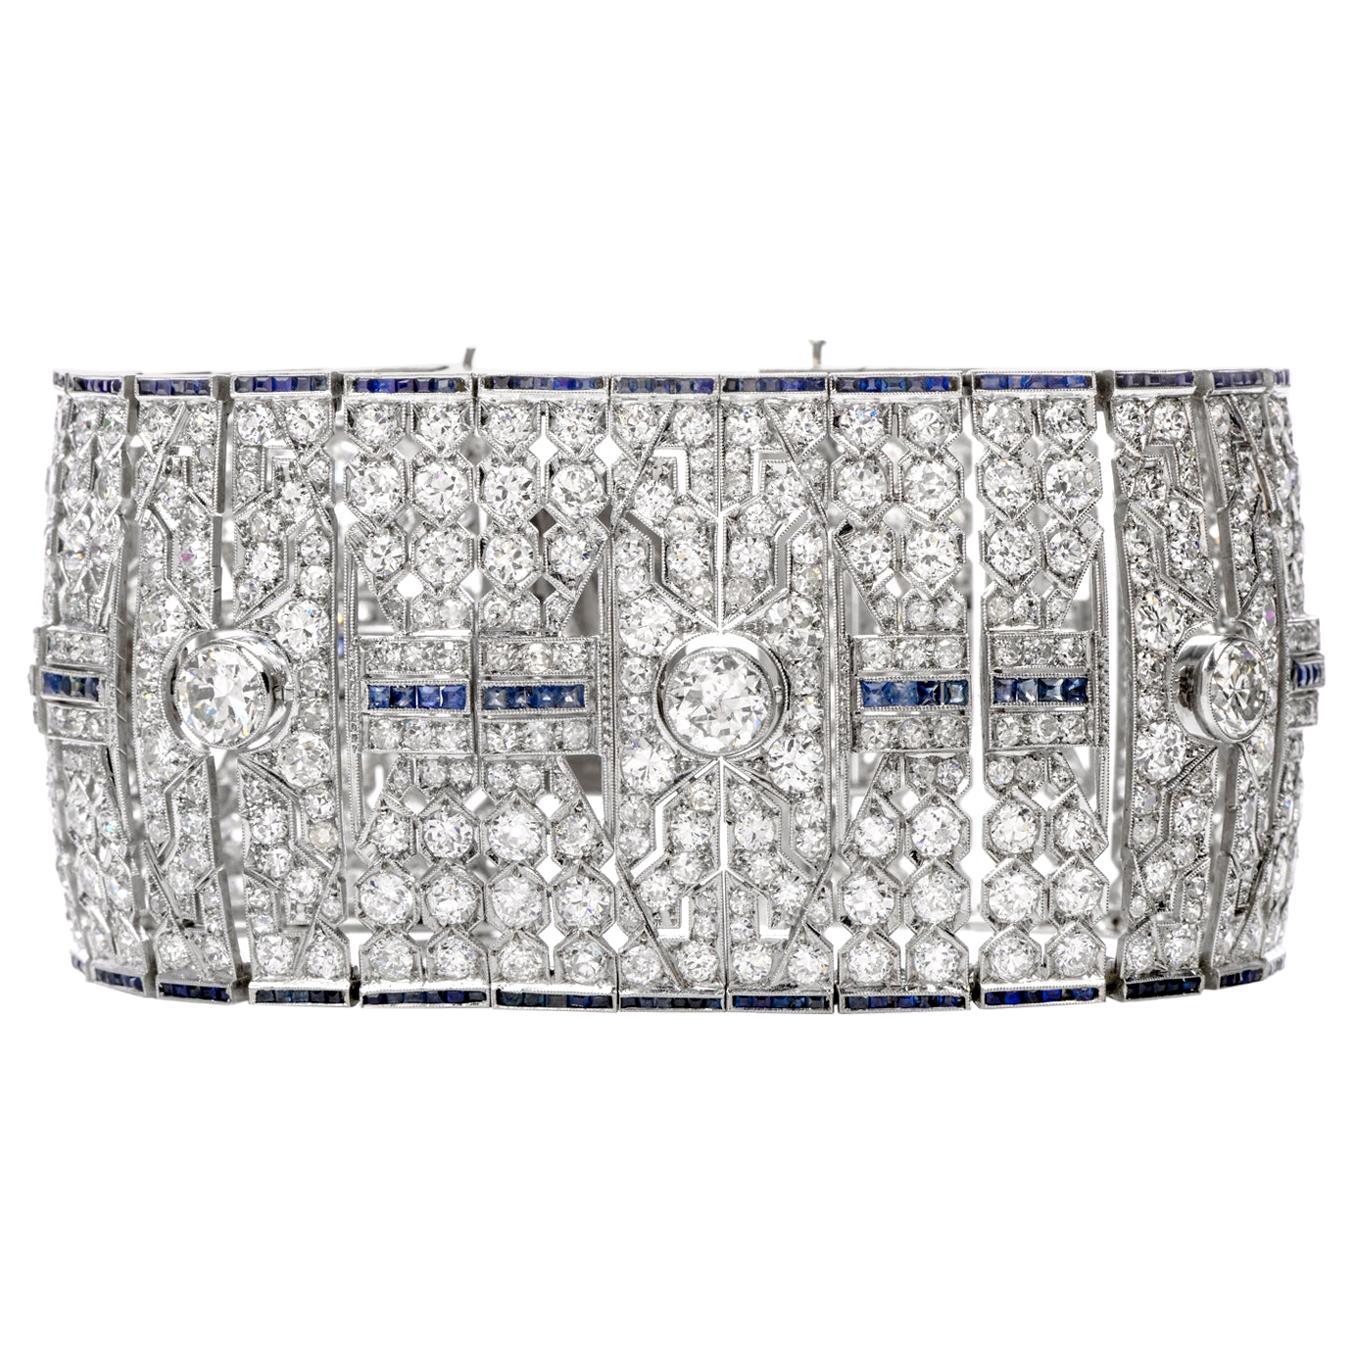 Wide Art Deco 41.78 Carat Diamond Sapphire Platinum Bracelet